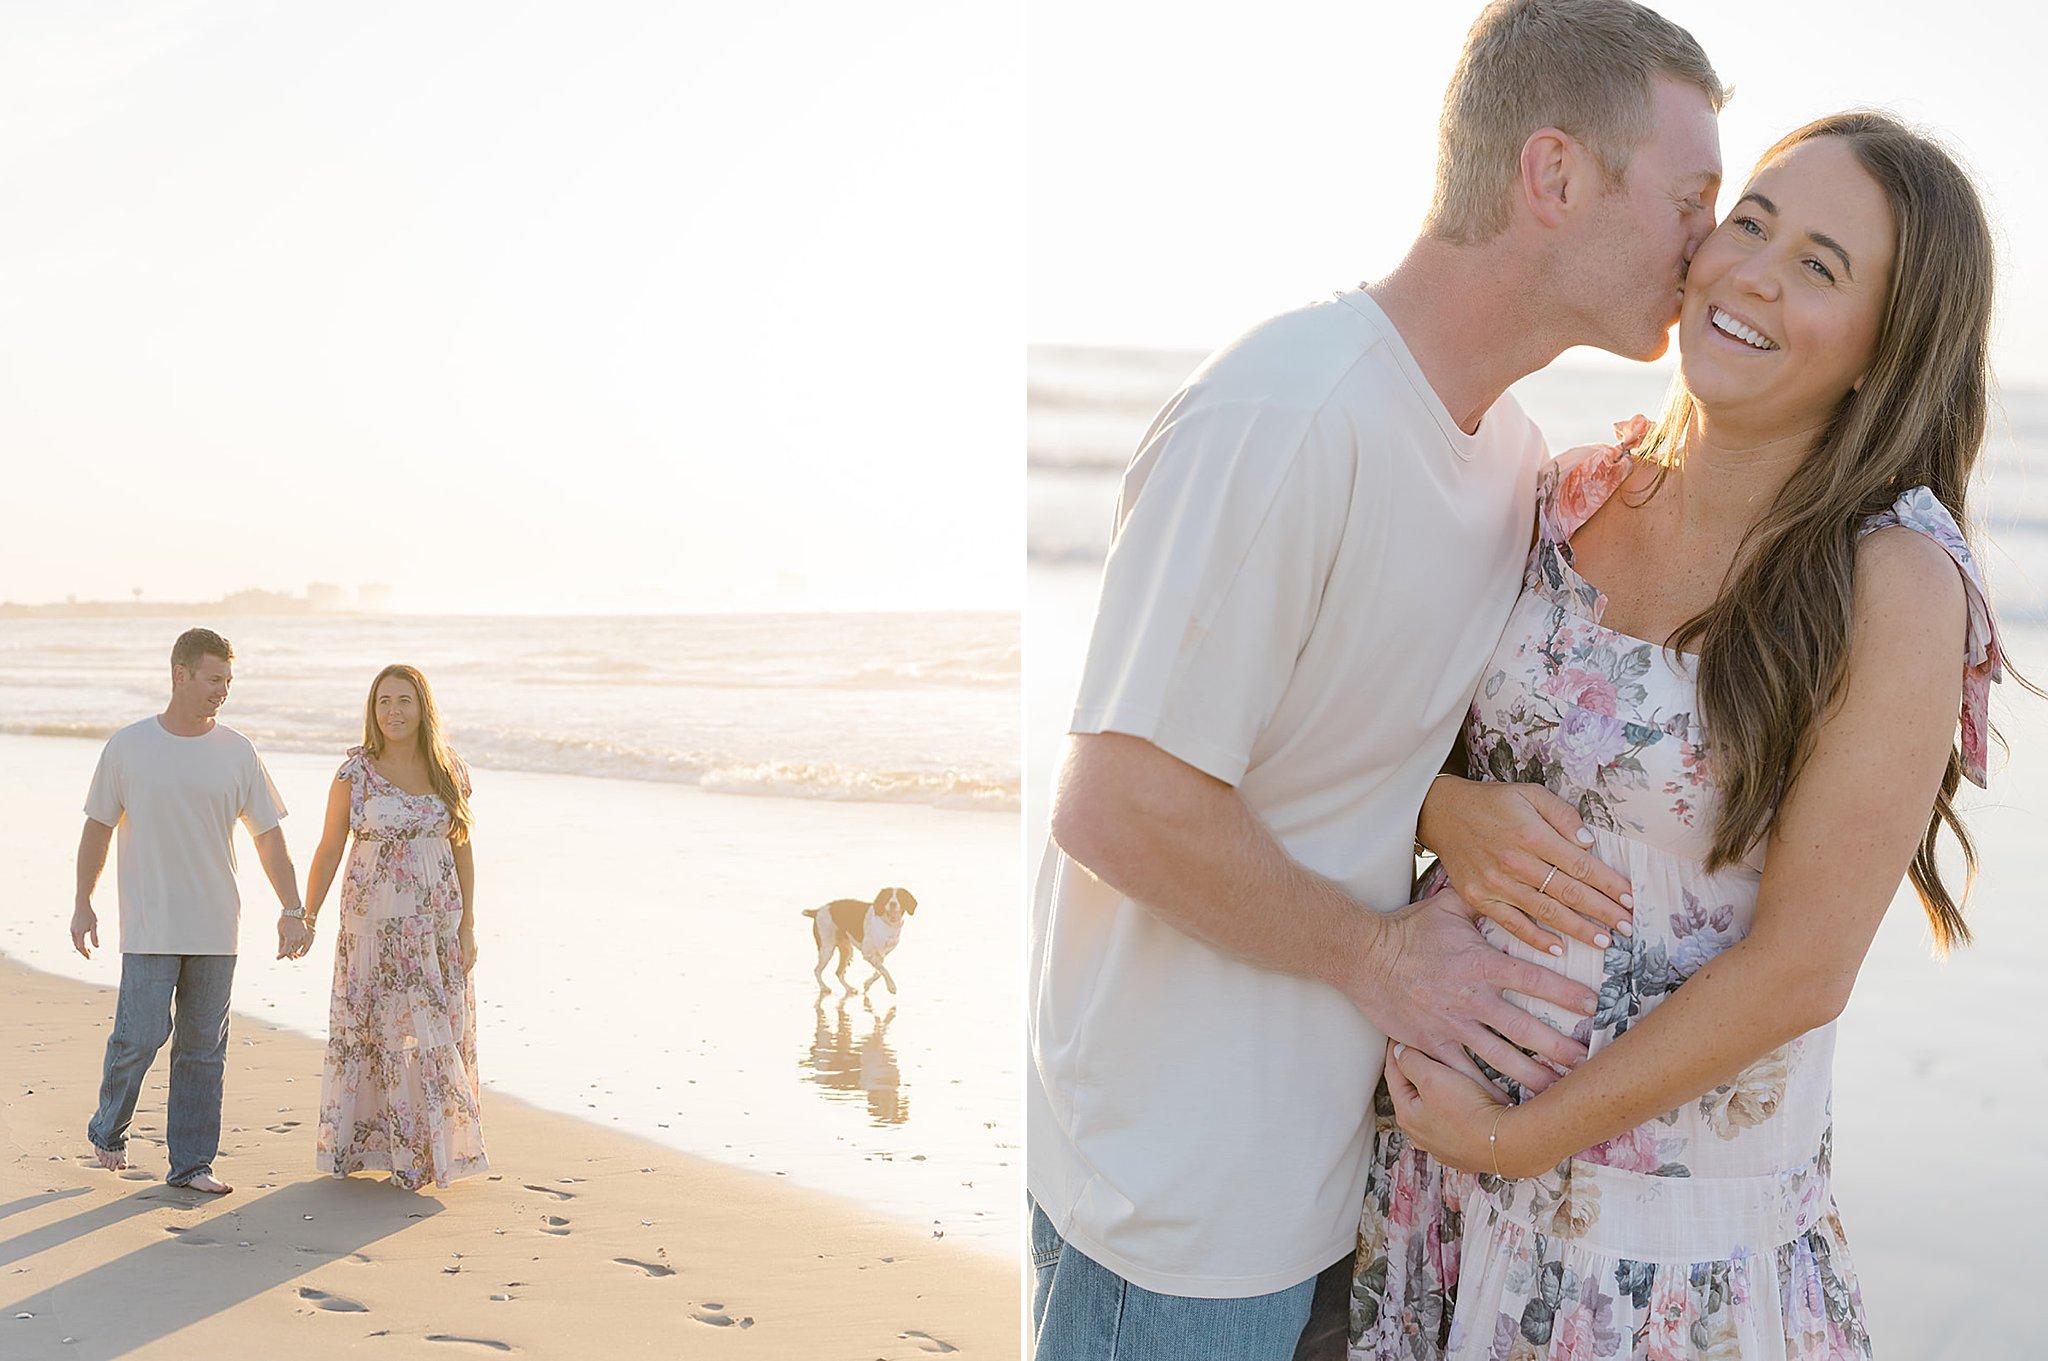 Ocean City NJ Gender Reveal Pregnancy Photography by Magdalena Studios 0018